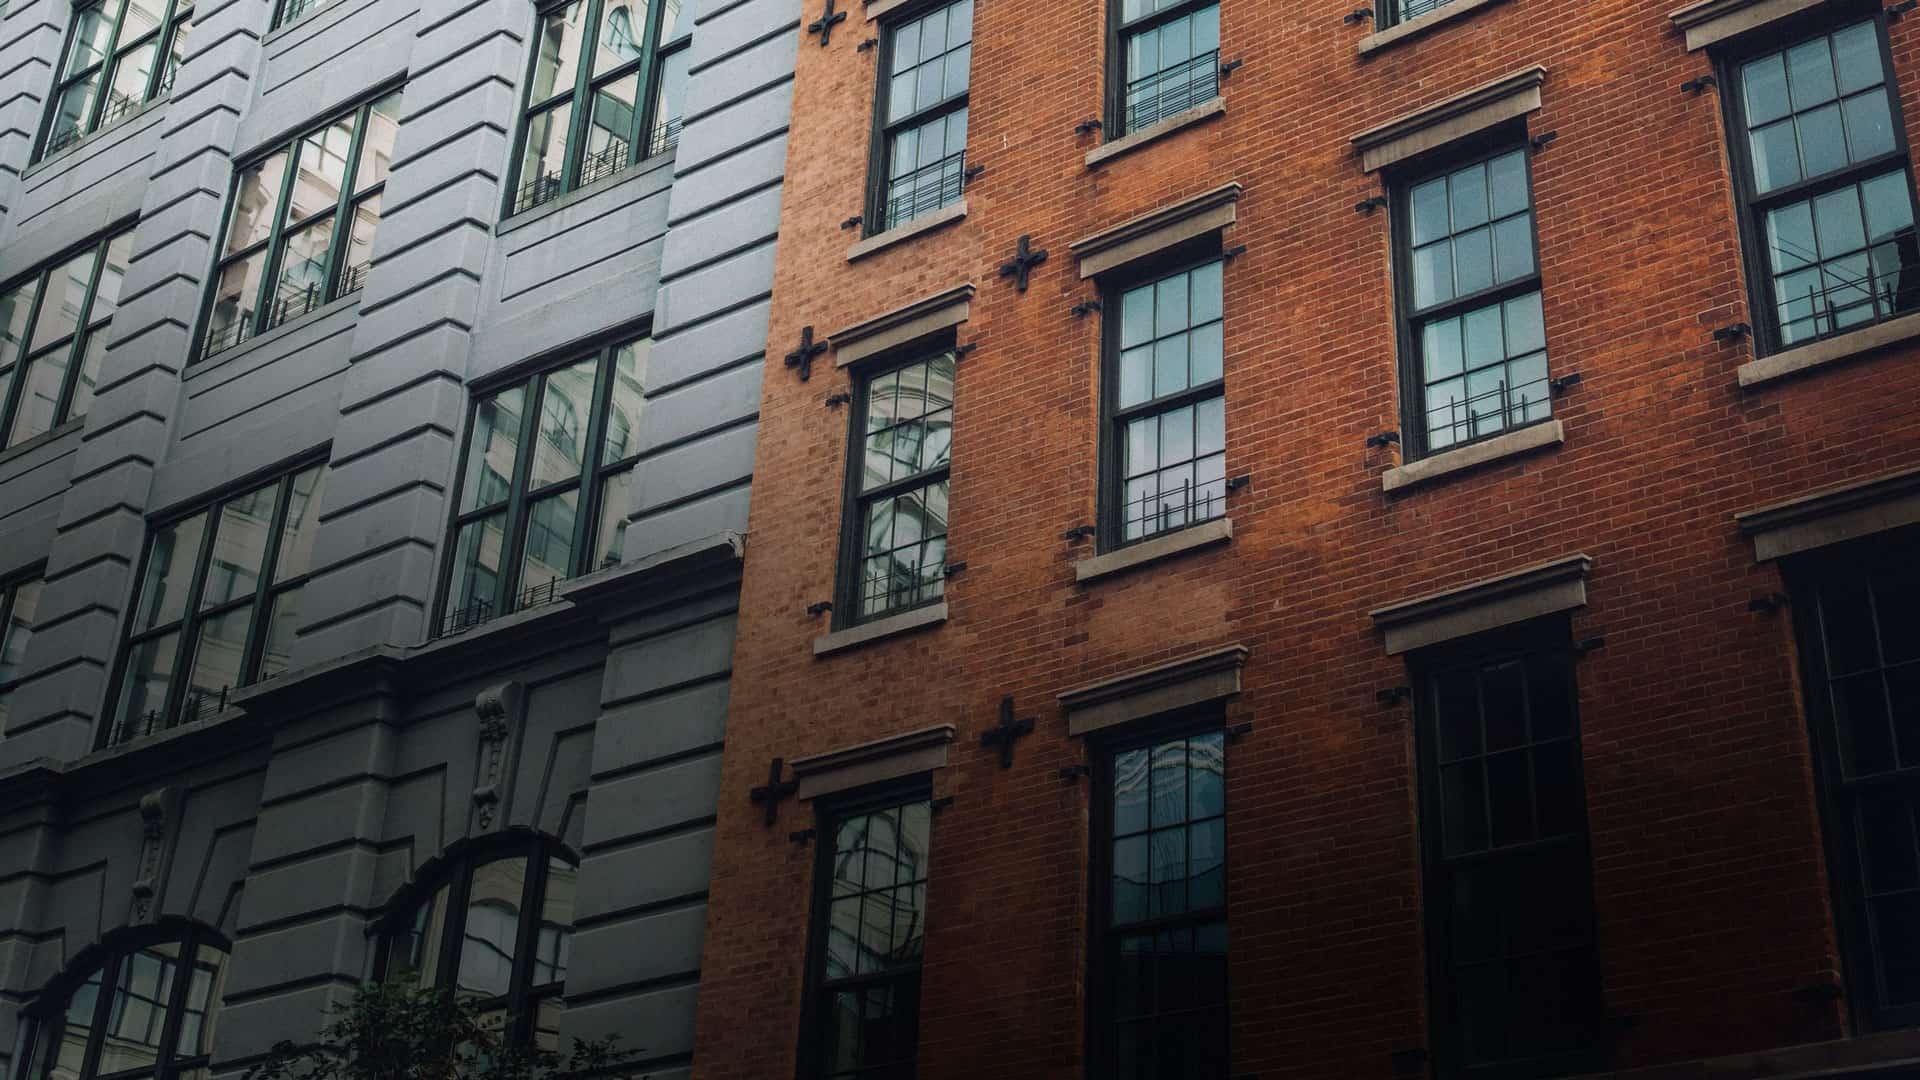 High-rise Apartment Buildings